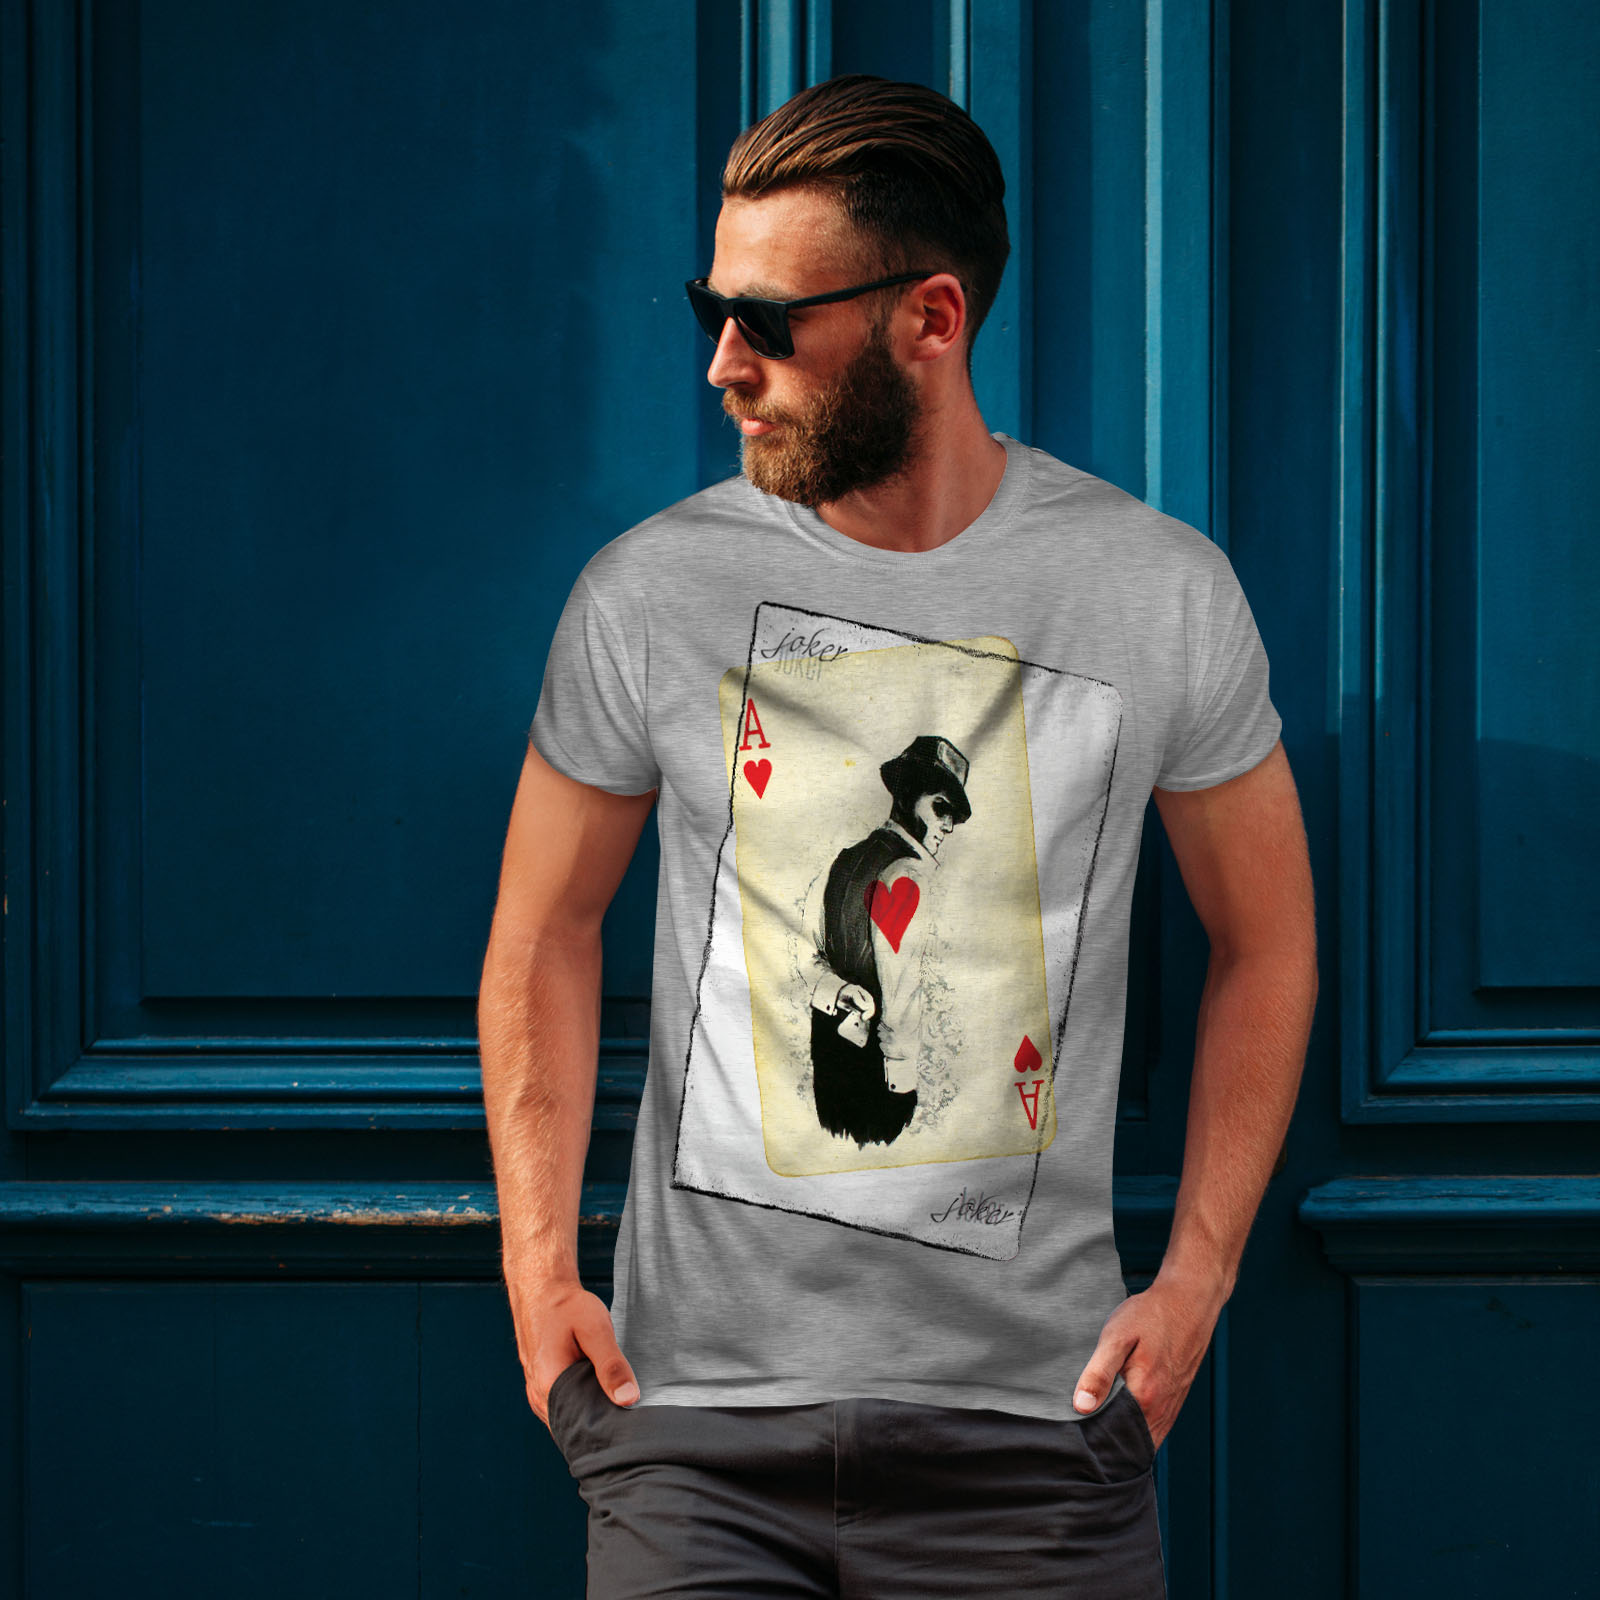 Wellcoda-POKER-misterioso-Da-Uomo-T-shirt-Gamble-design-grafico-stampato-T-shirt miniatura 16